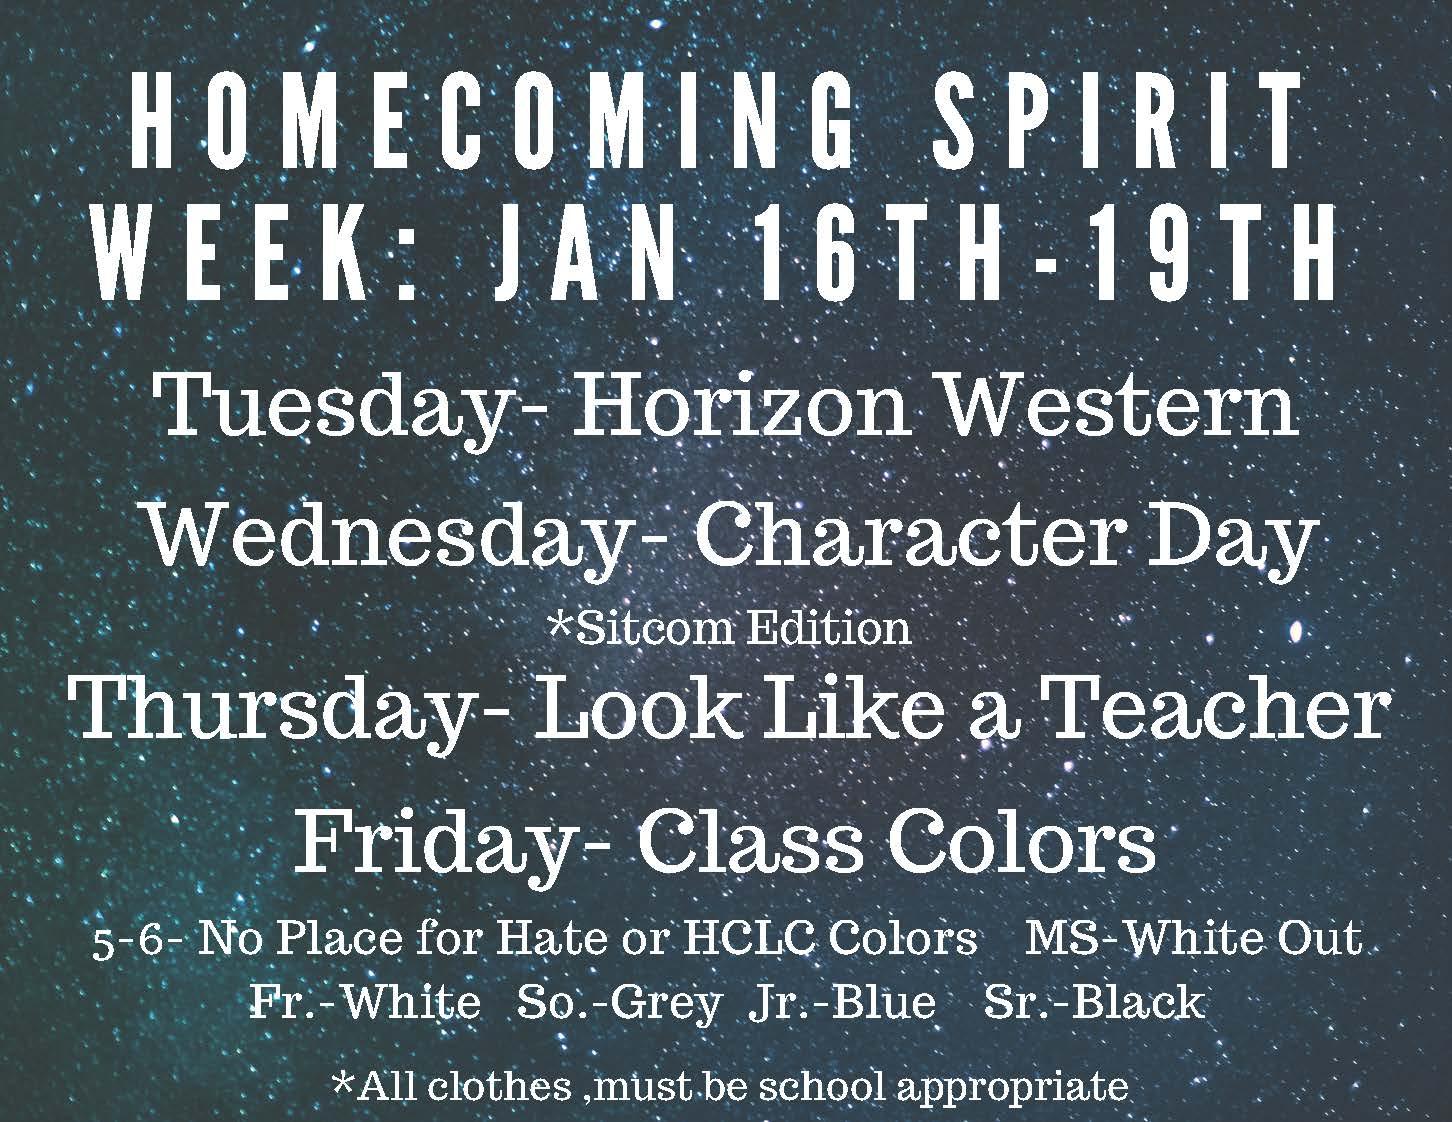 hs-homecoming-spirit-week-graphic.jpg